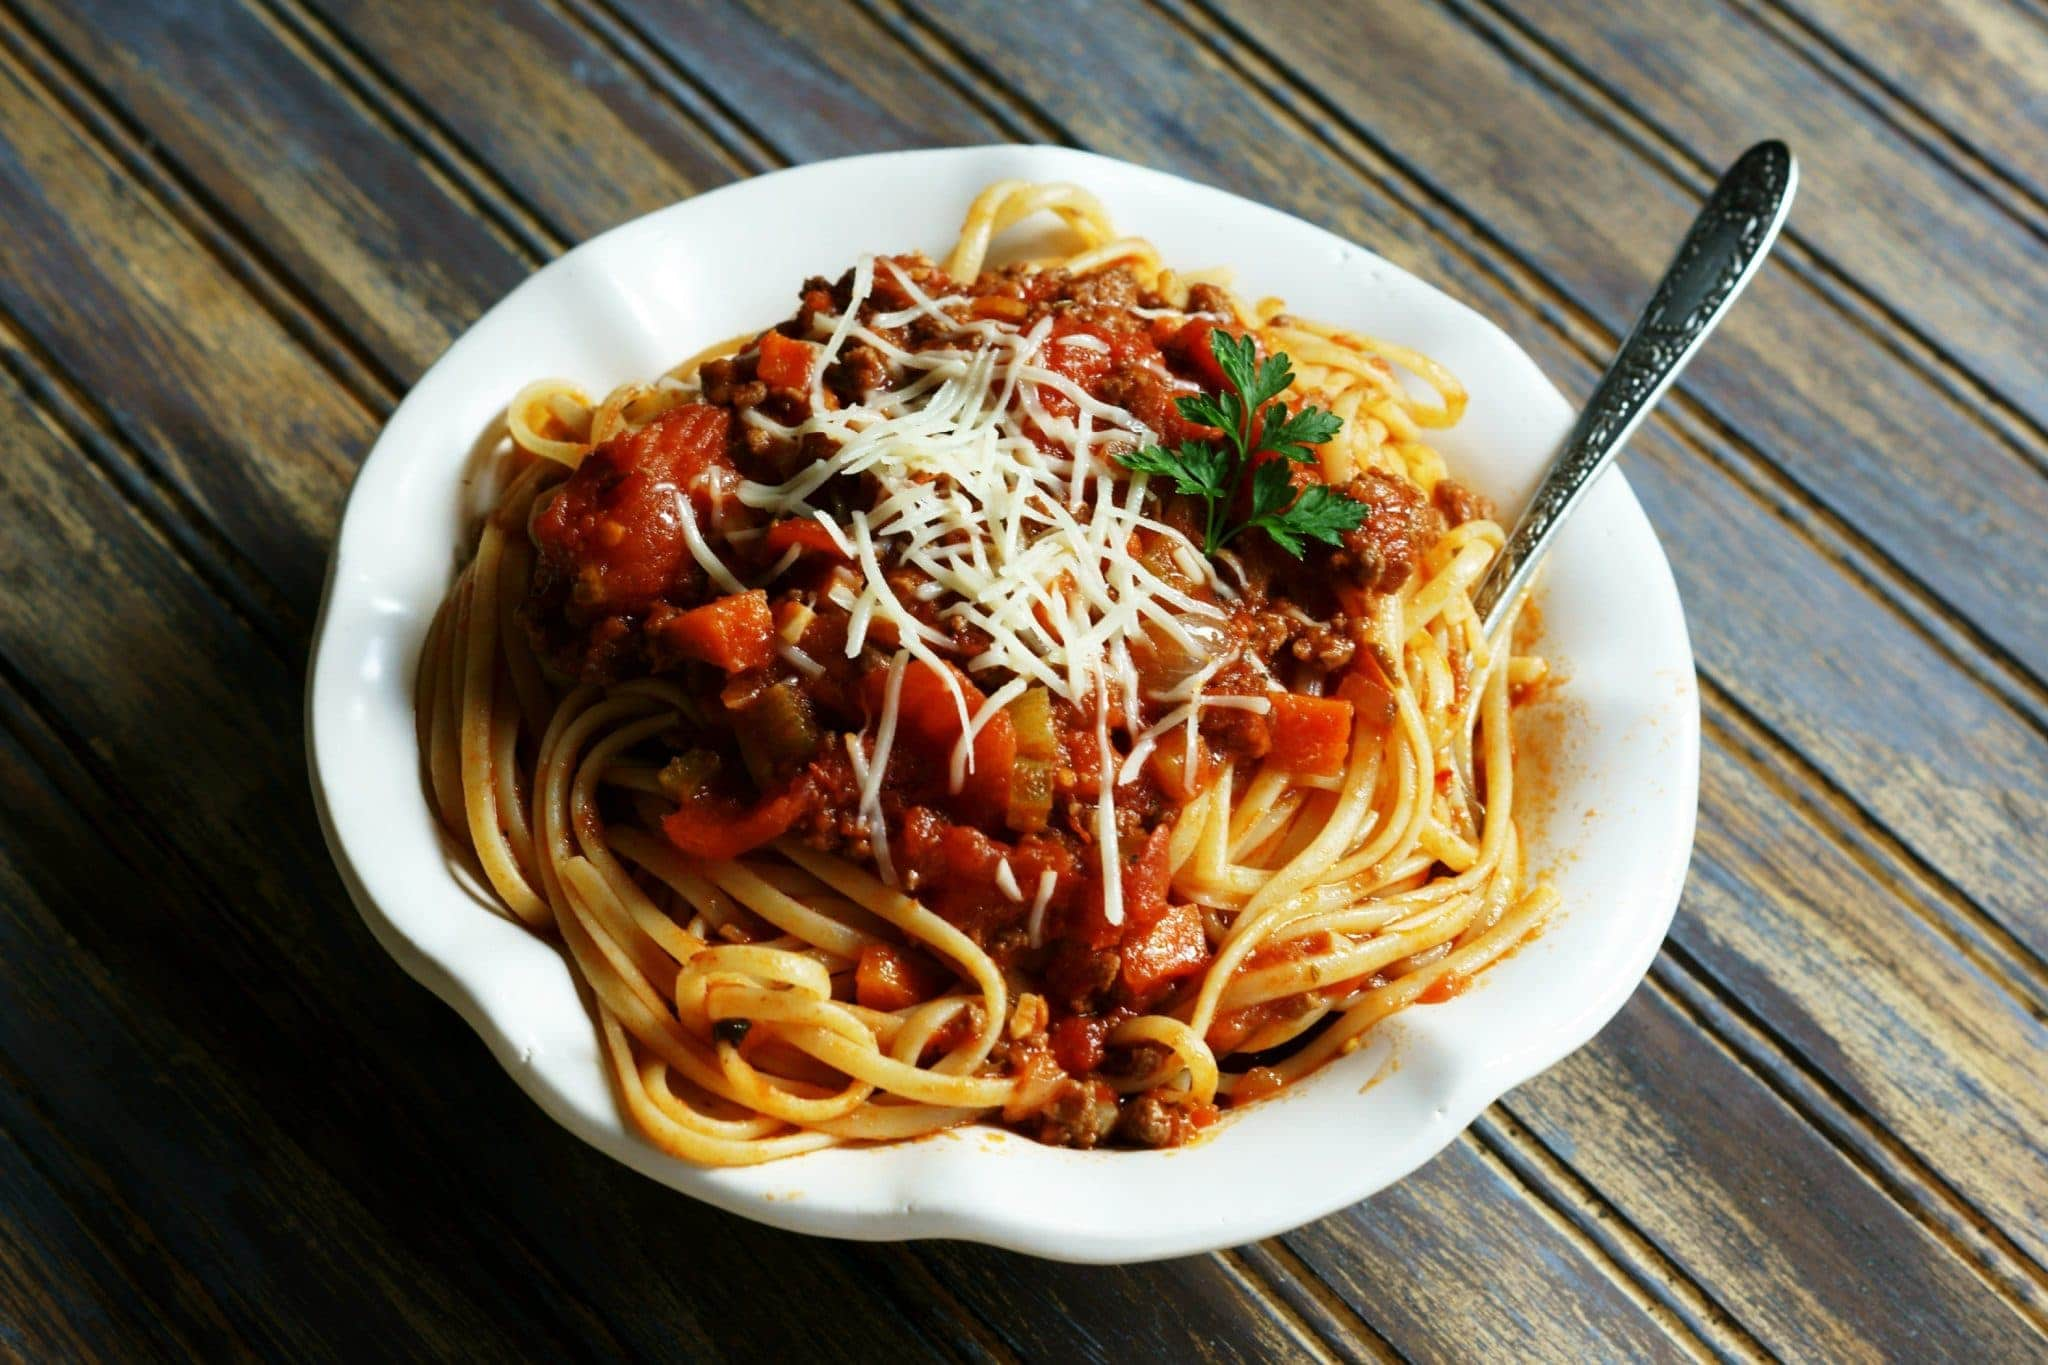 Homemade Italian spaghetti sauce is easy to prepare.